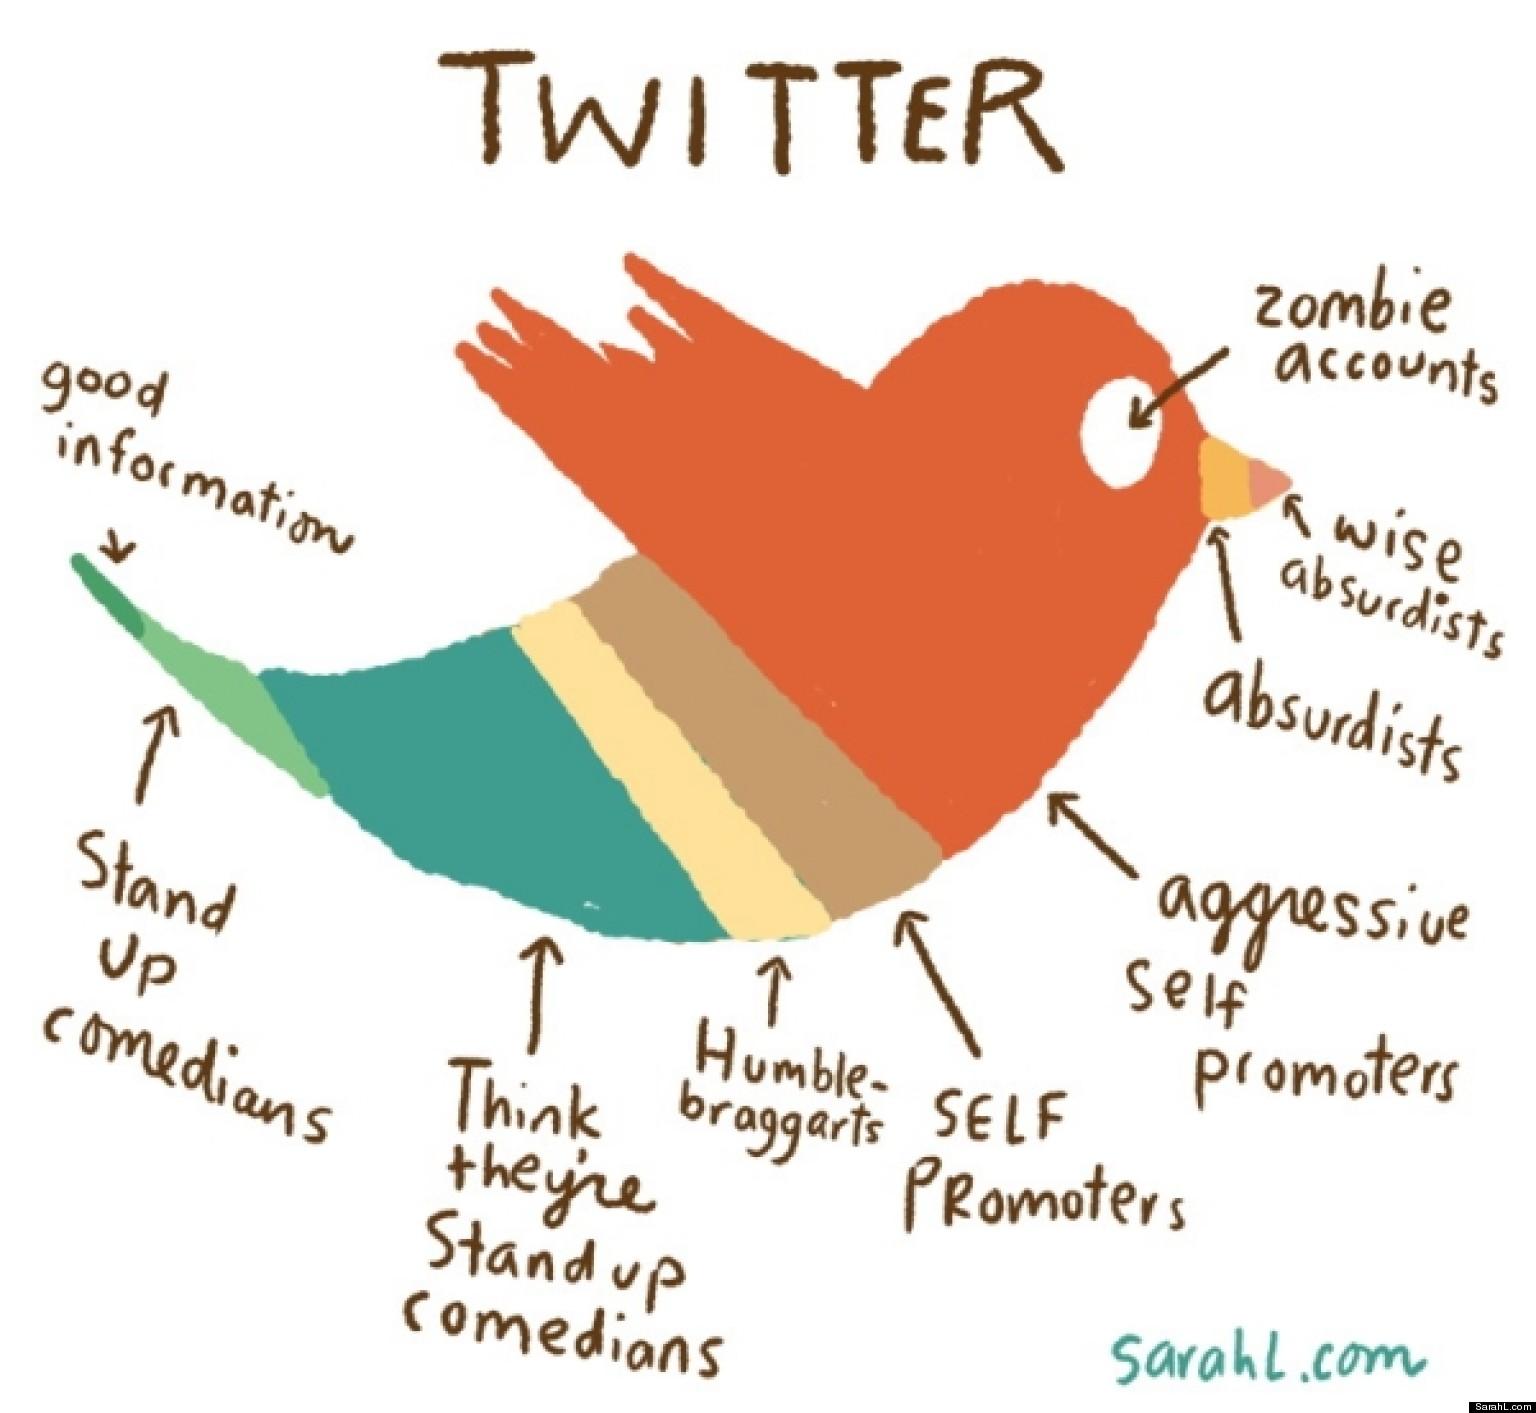 Twitter Explained (CHART)